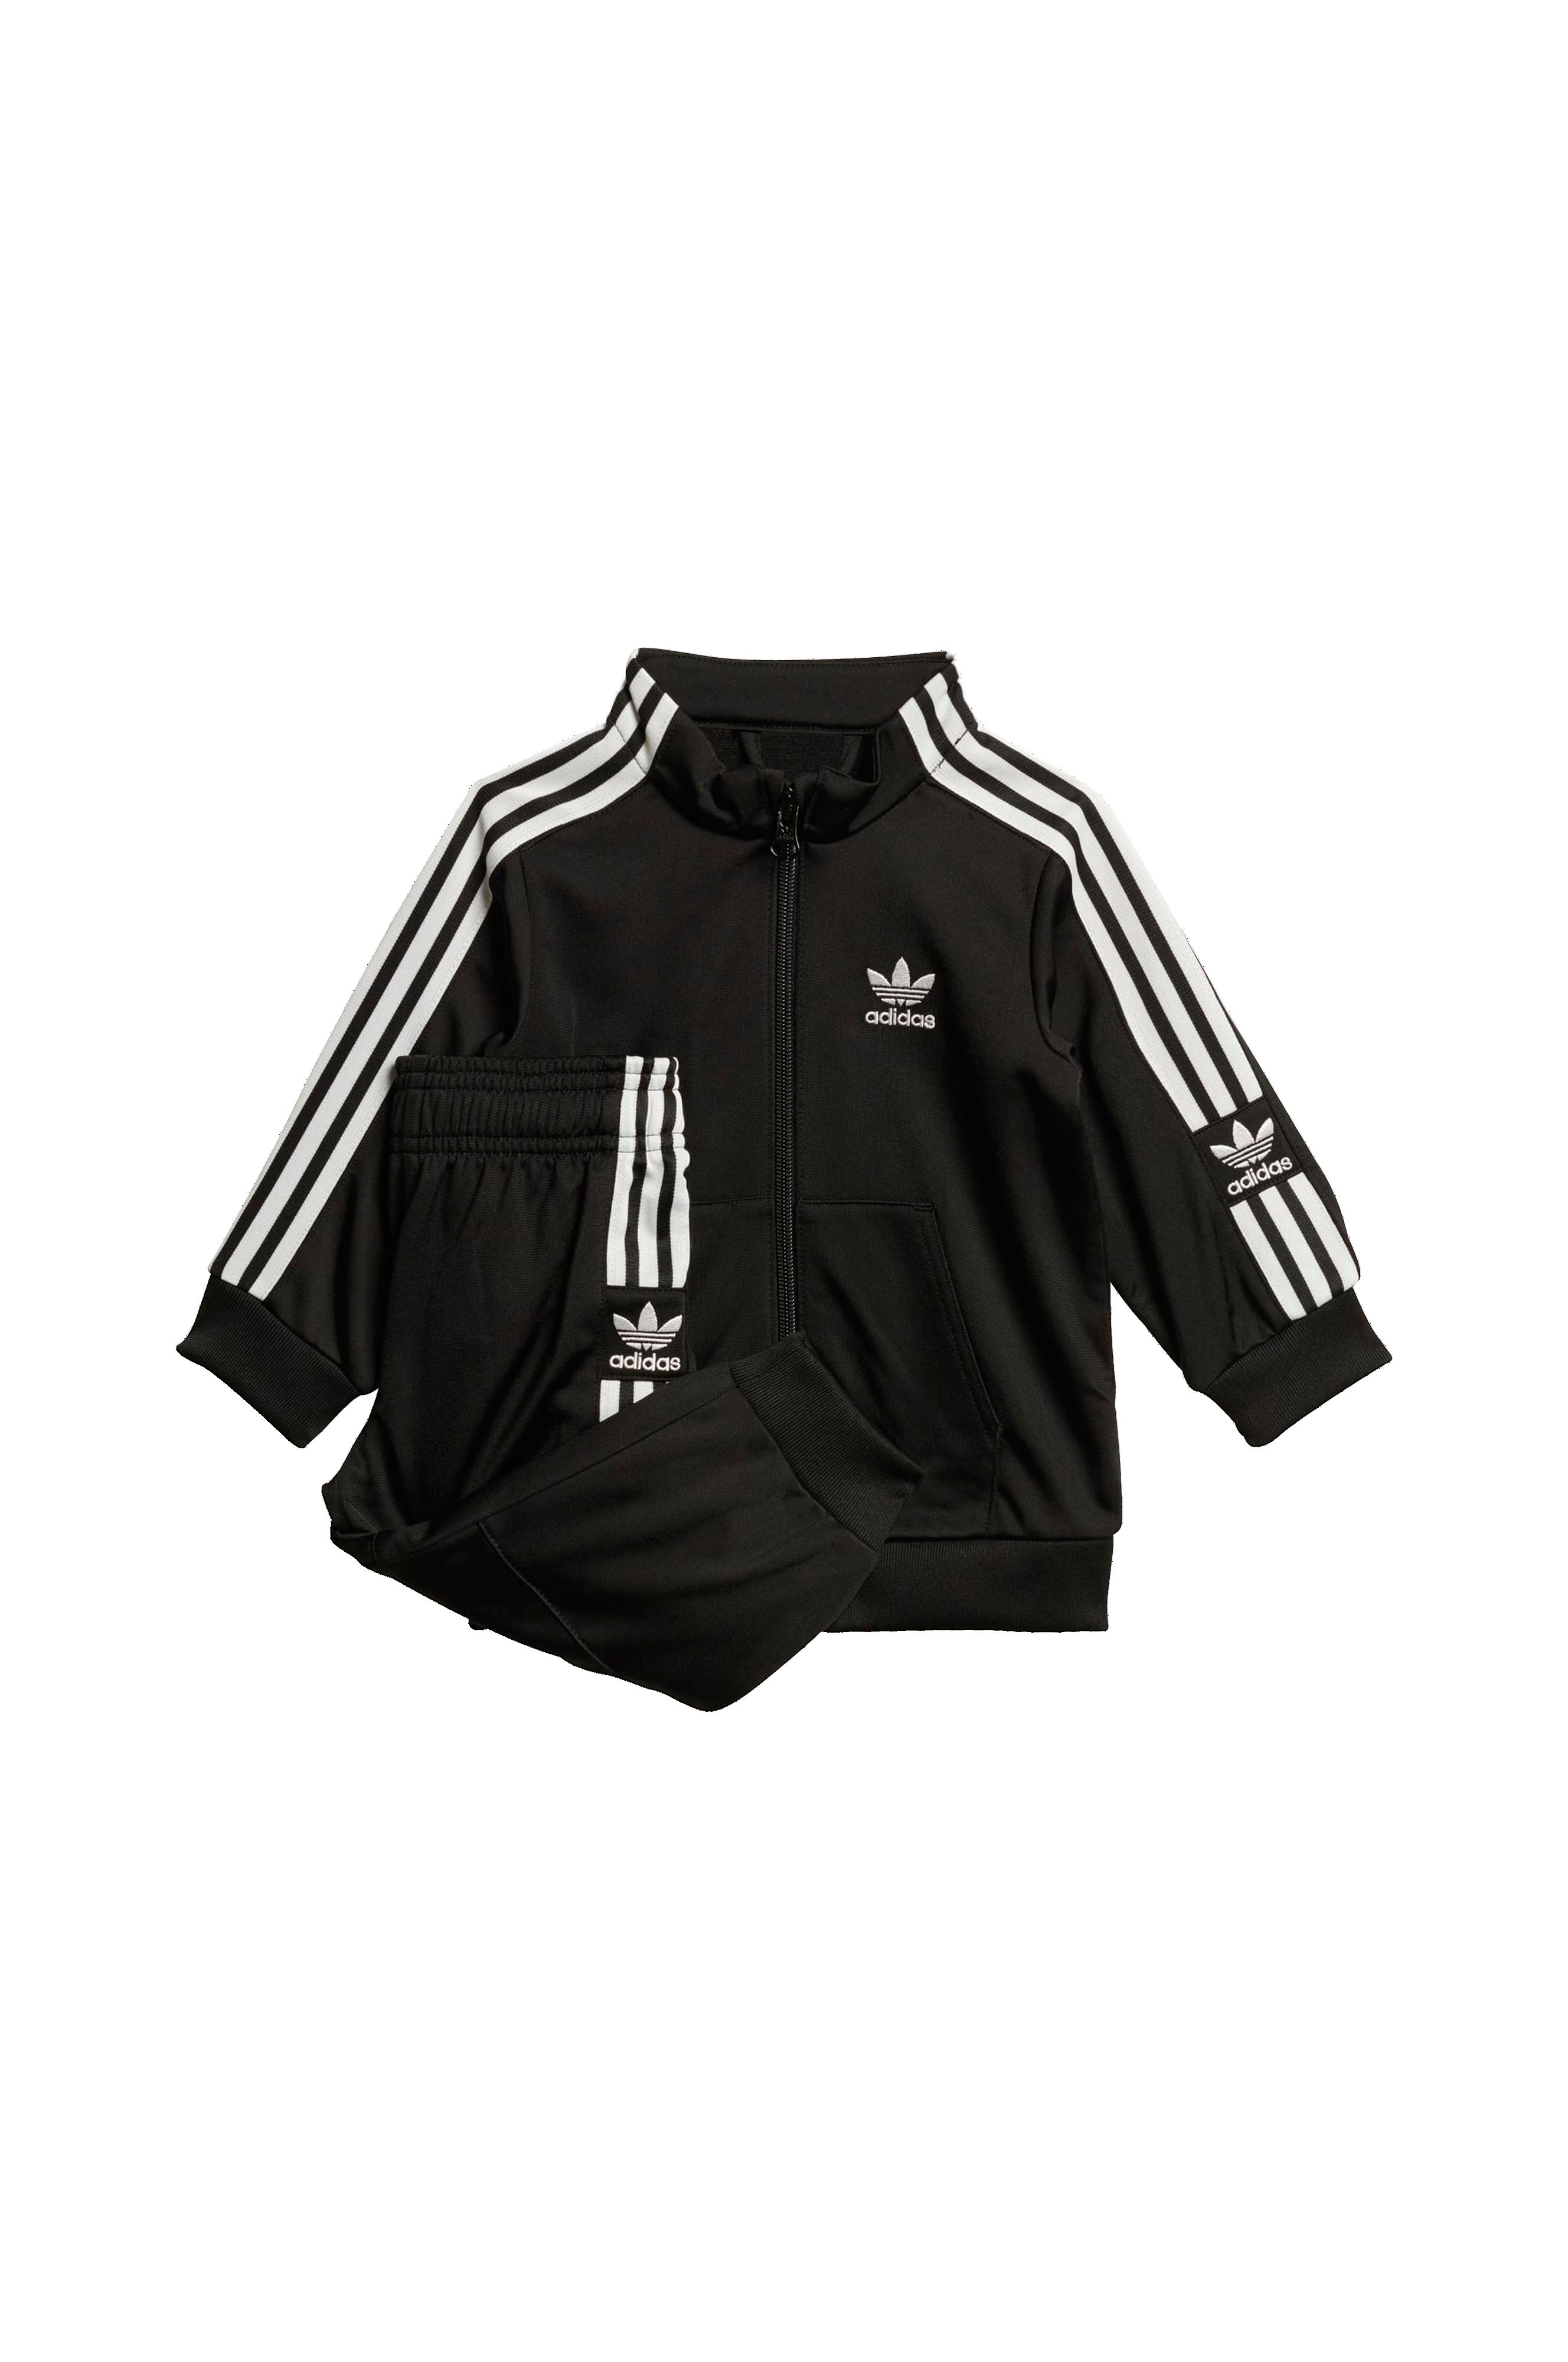 adidas Originals Treningsdress Track Suit, 2 deler Svart